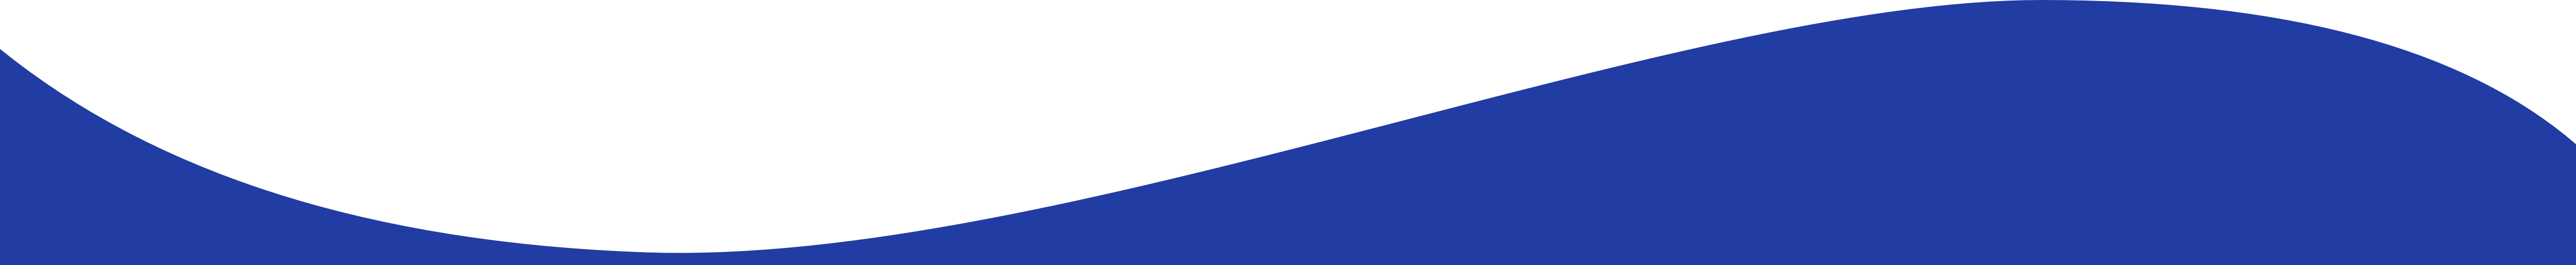 wave-blue-background@3x